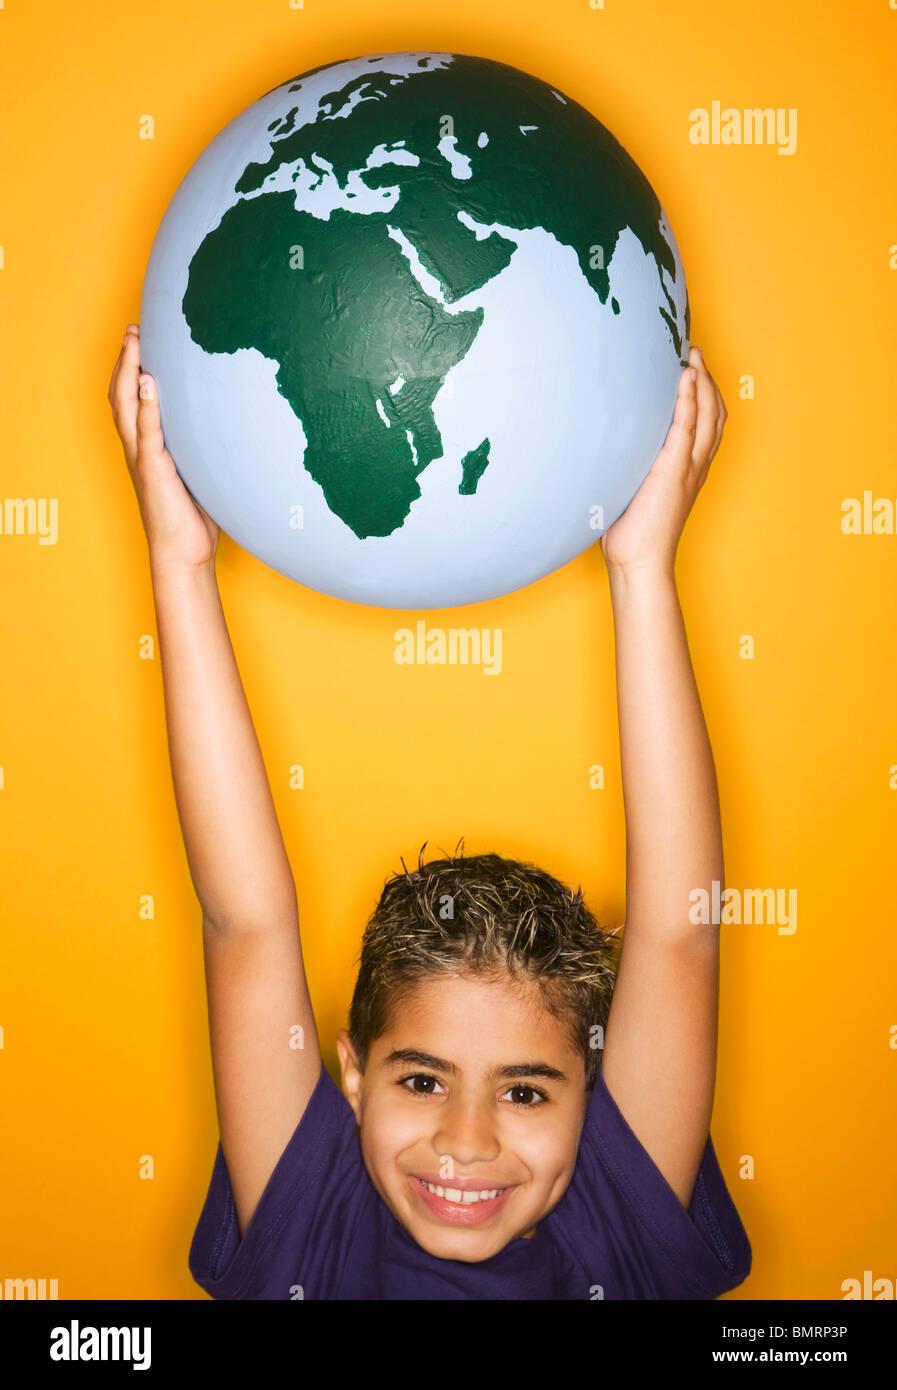 A Boy Holding A Globe - Stock Image